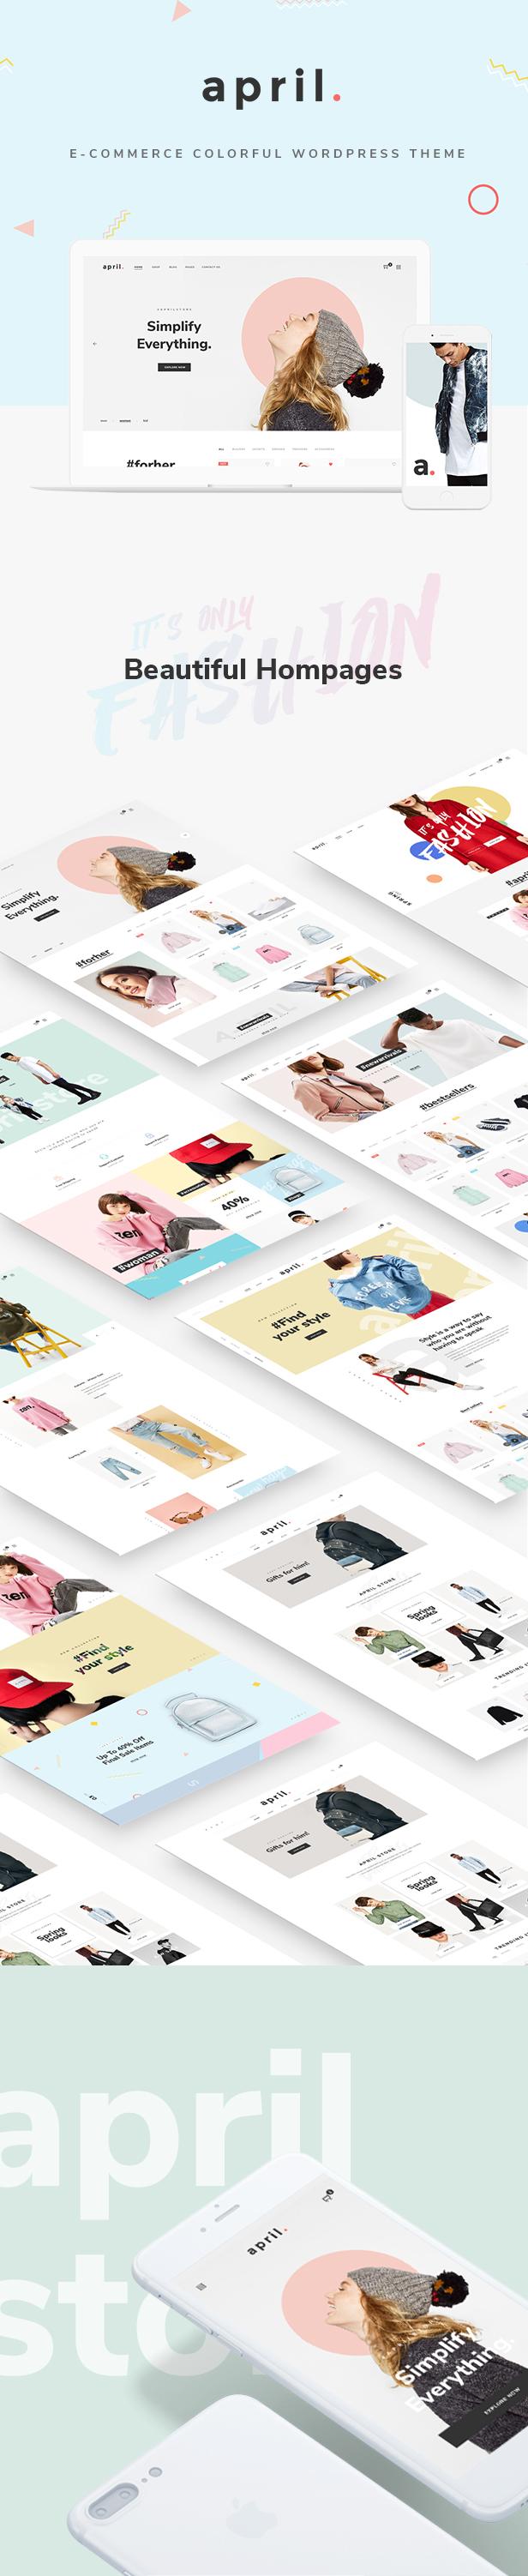 APRIL - Wunderbare Mode WooCommerce WordPress Vorlage - 23